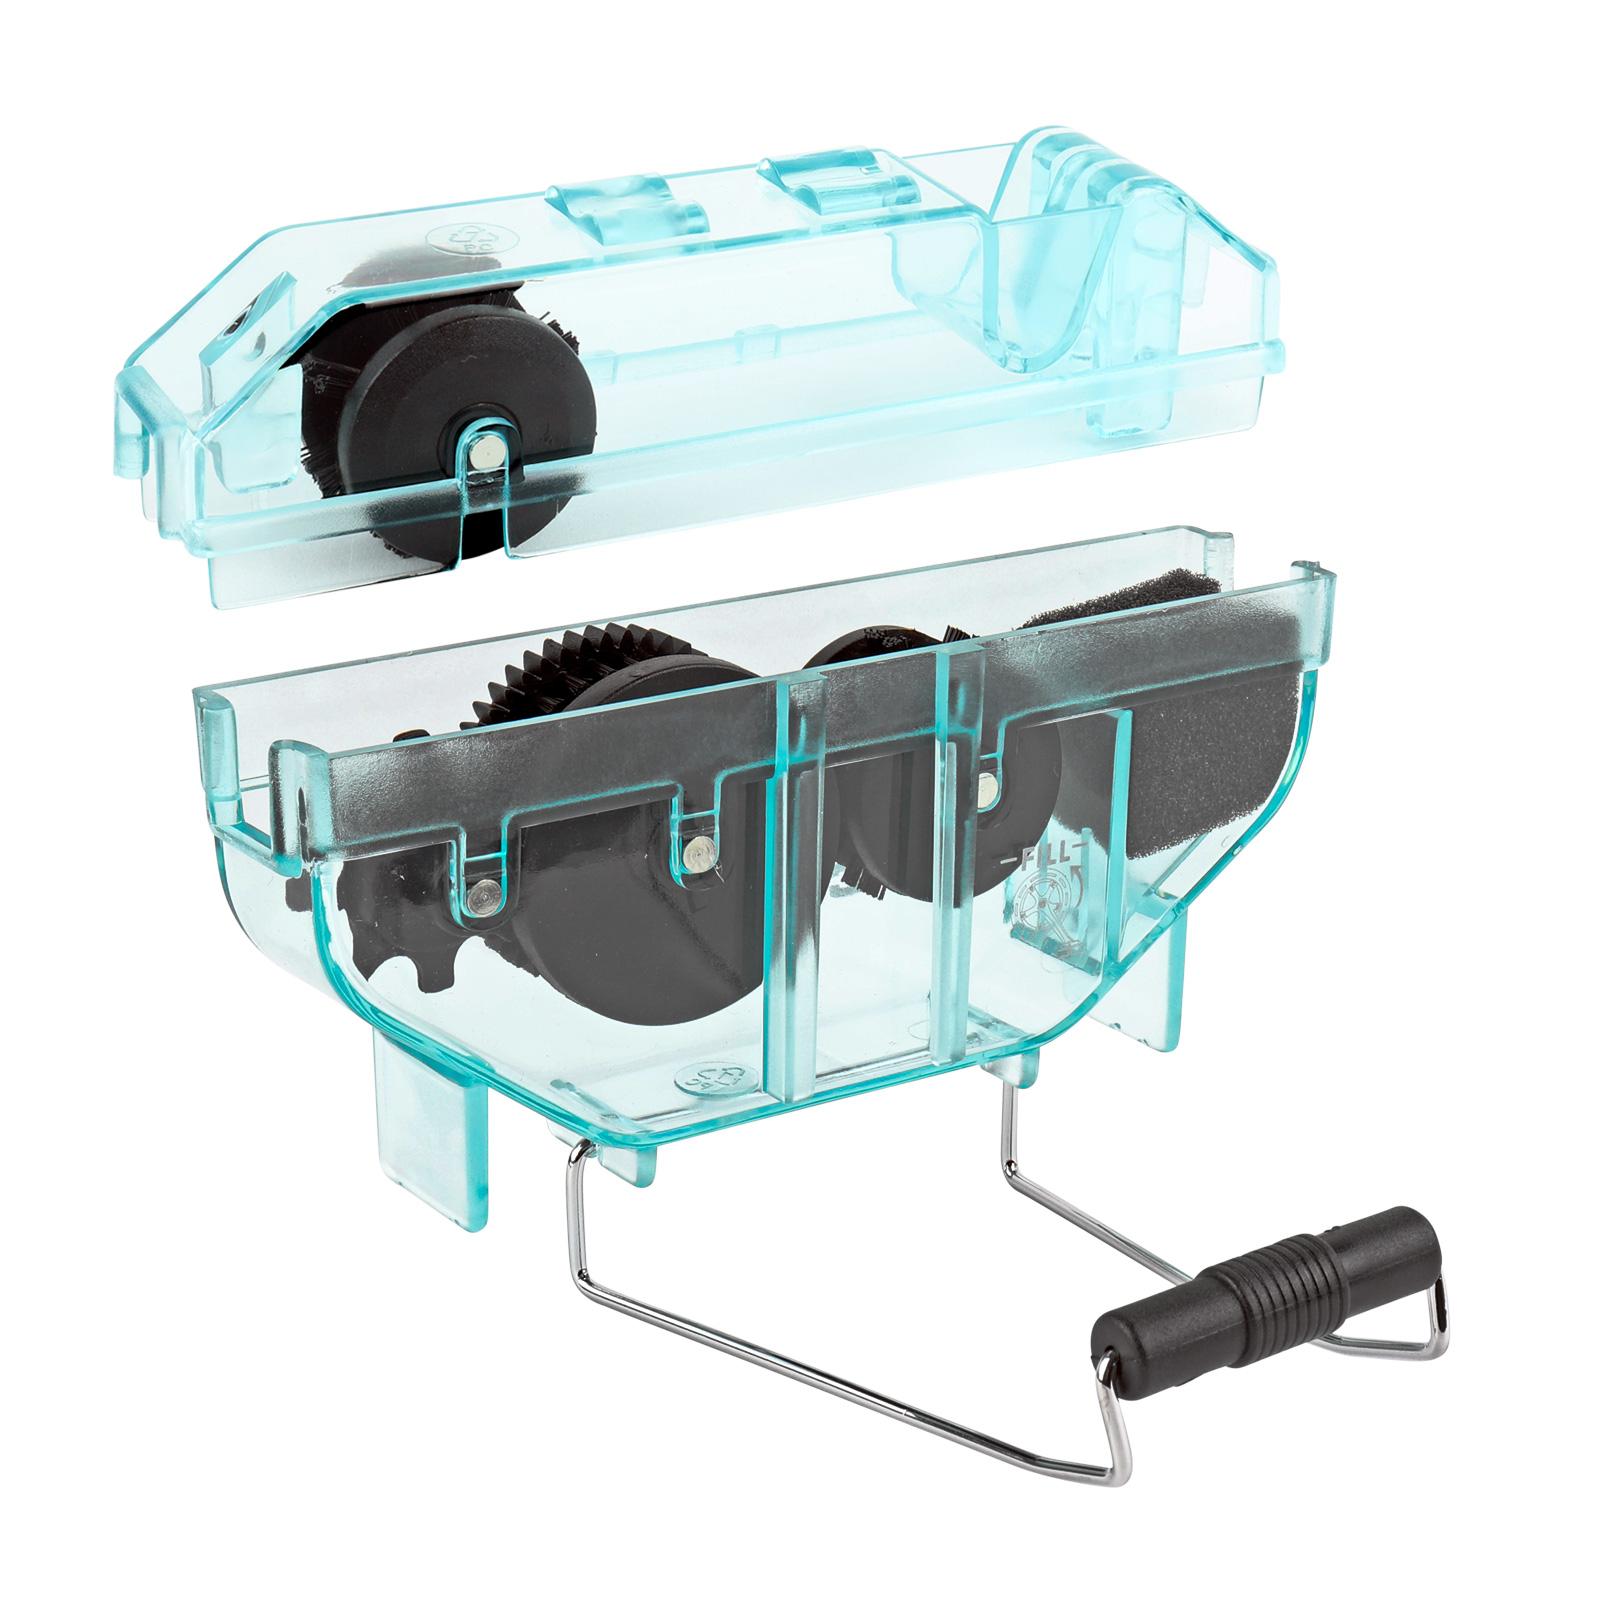 CONTEC Kettenreinigungsgerät, tropffestes Gehäuse, blau - transparent